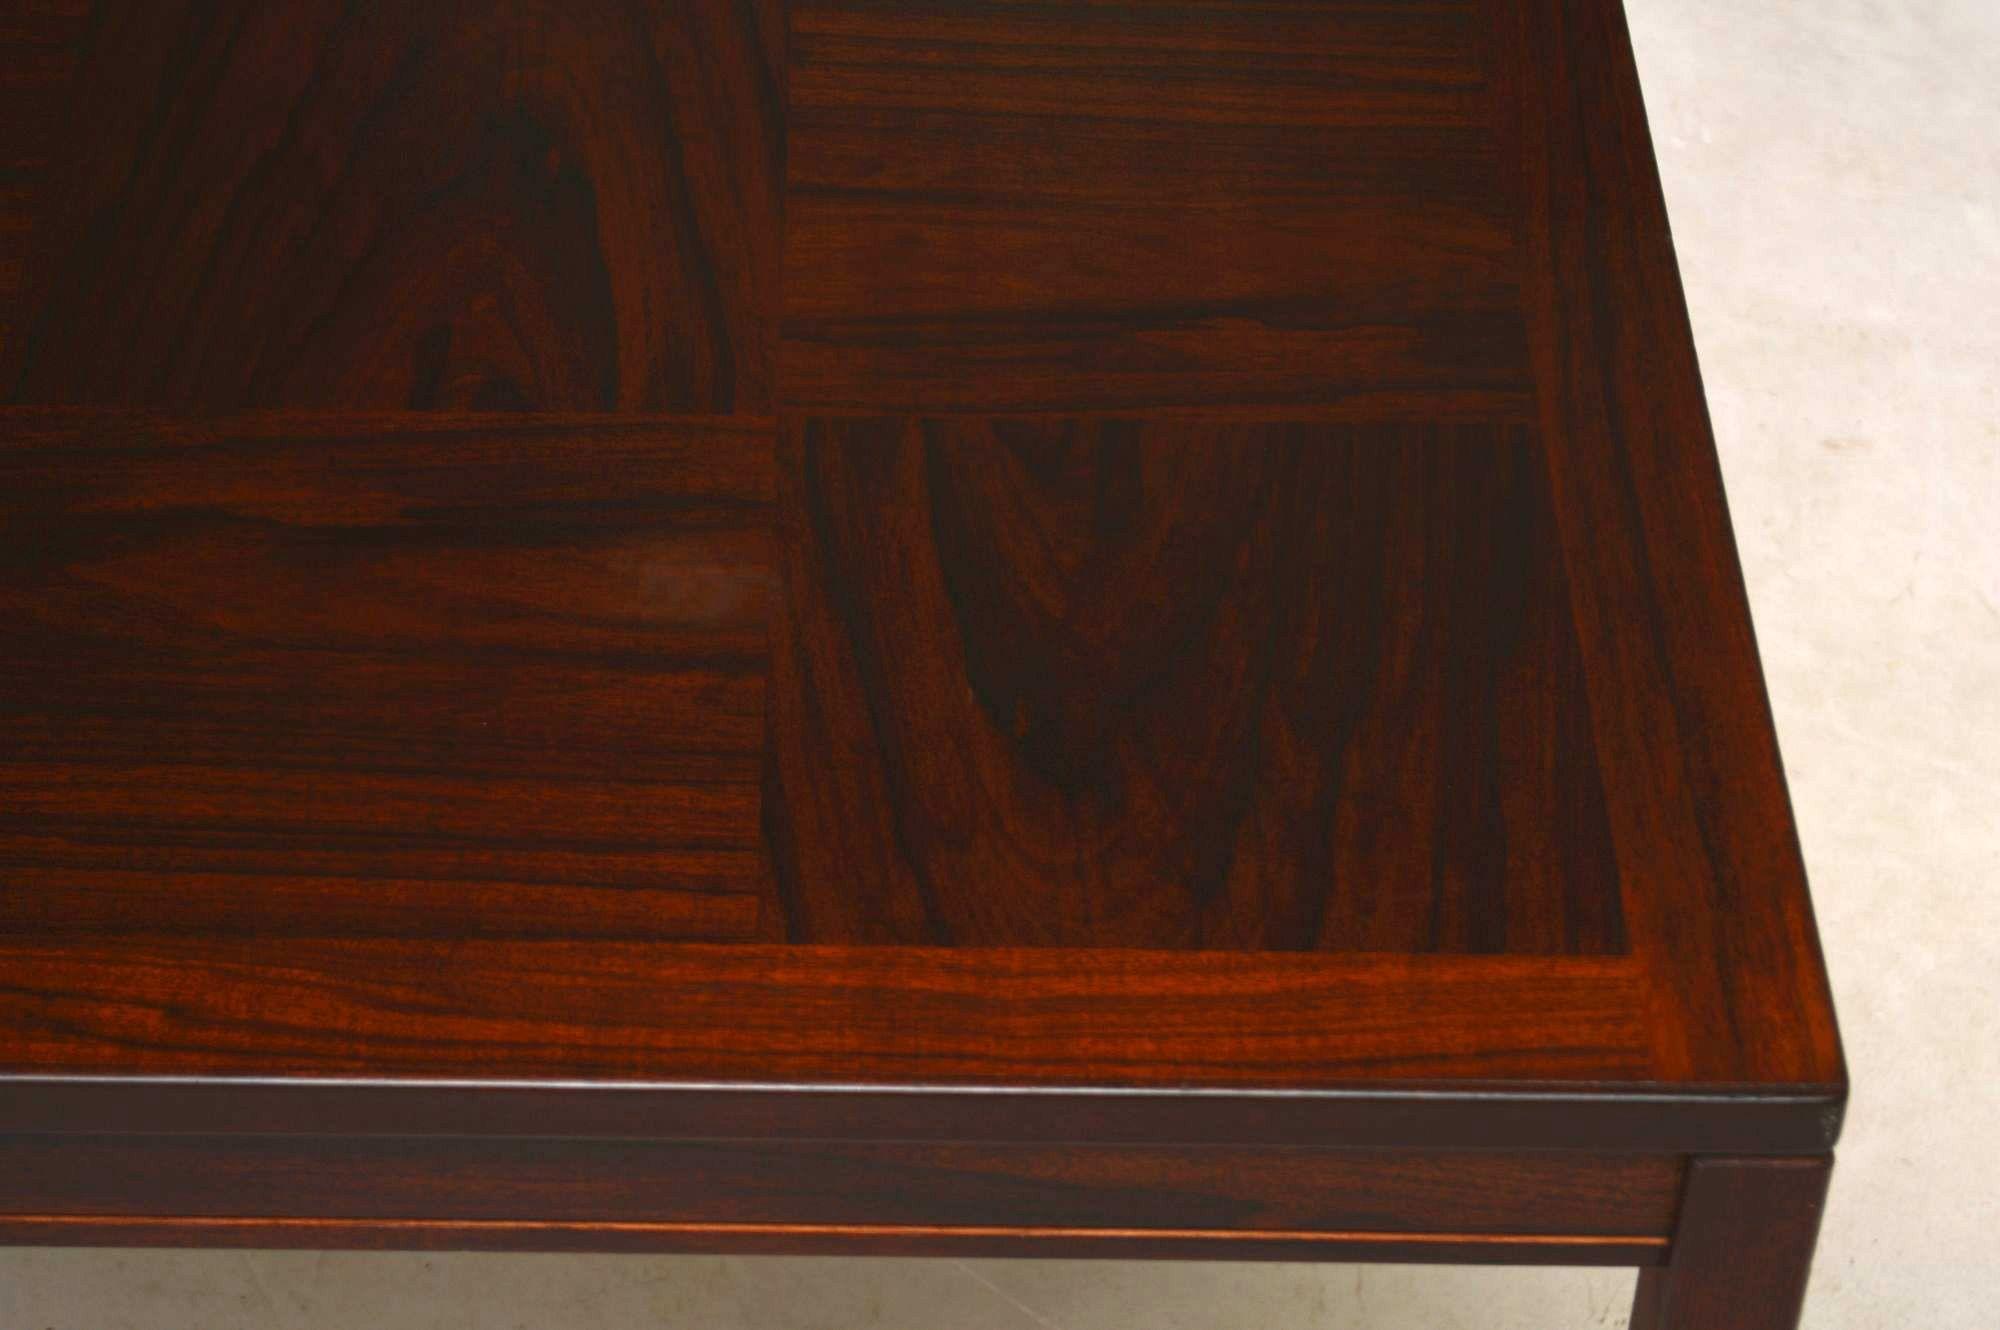 Rosewood Scandinavian Vintage Coffee Table By Heggen Of